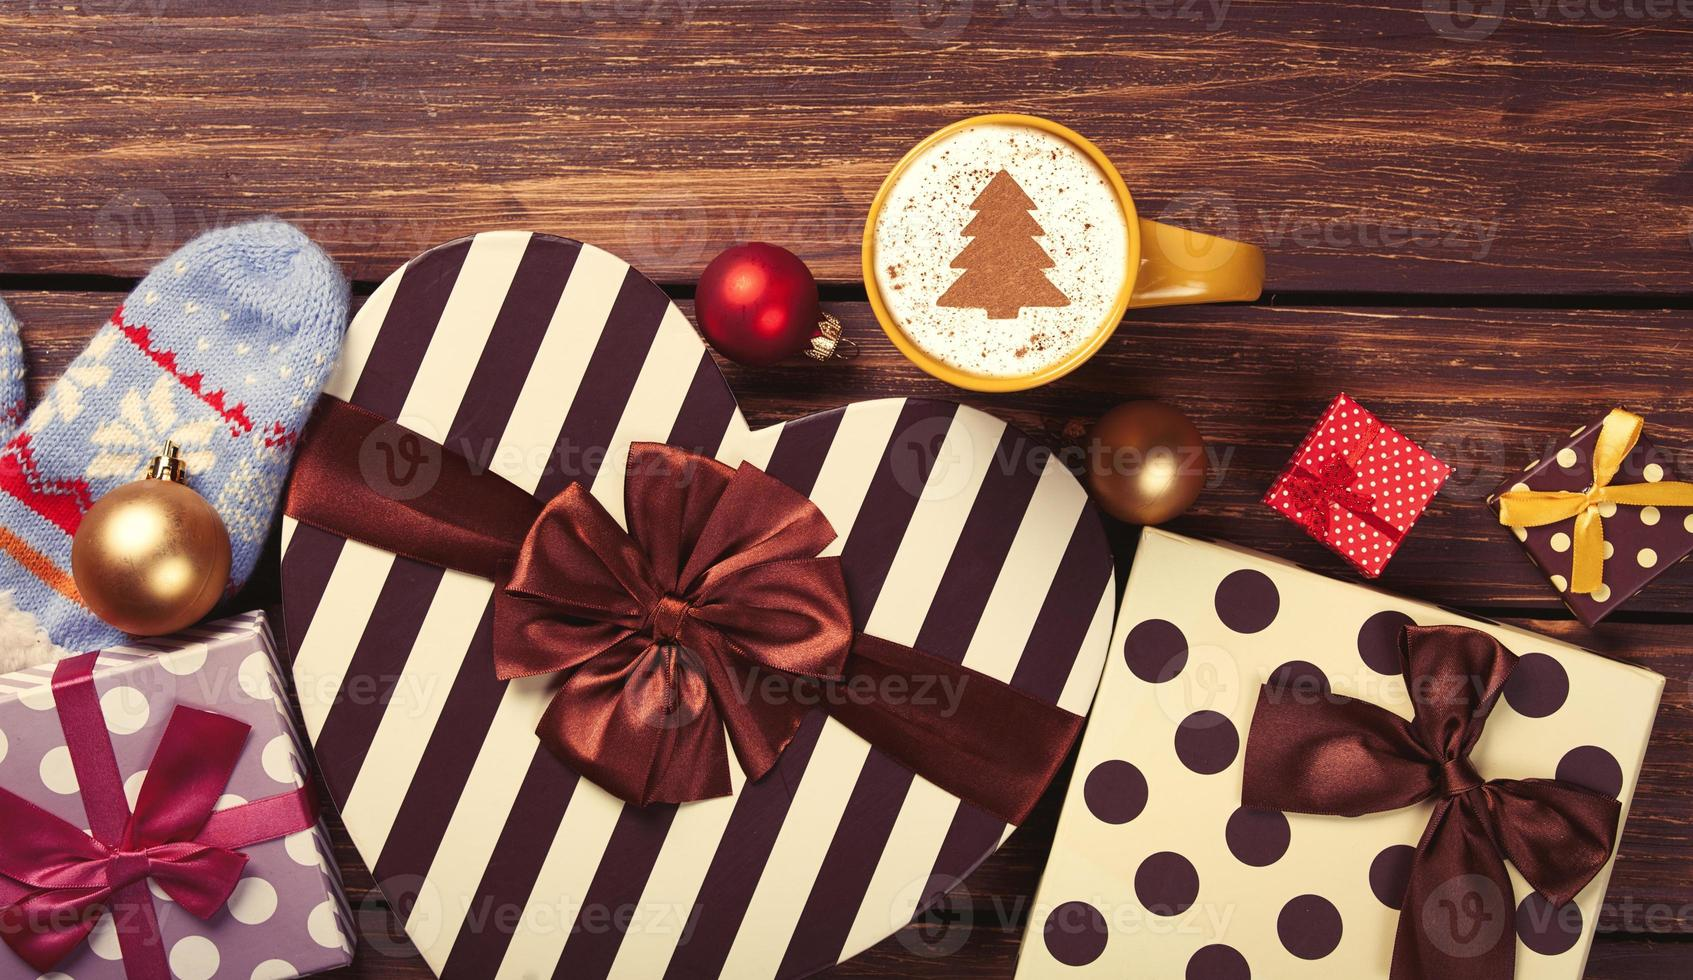 cappuccino com formato de árvore de natal e presentes foto